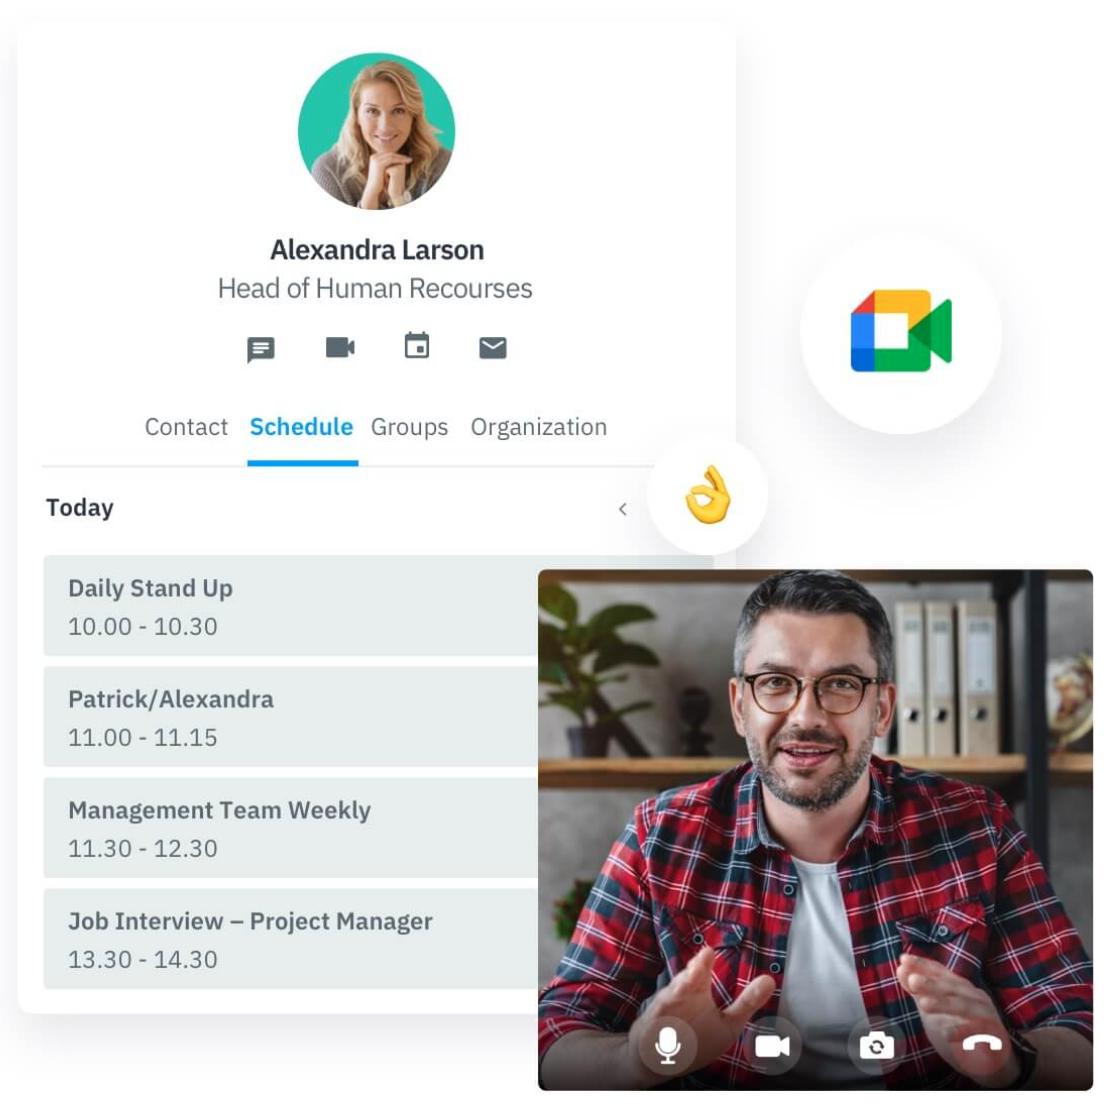 Improve remote worker experience: Video meetings